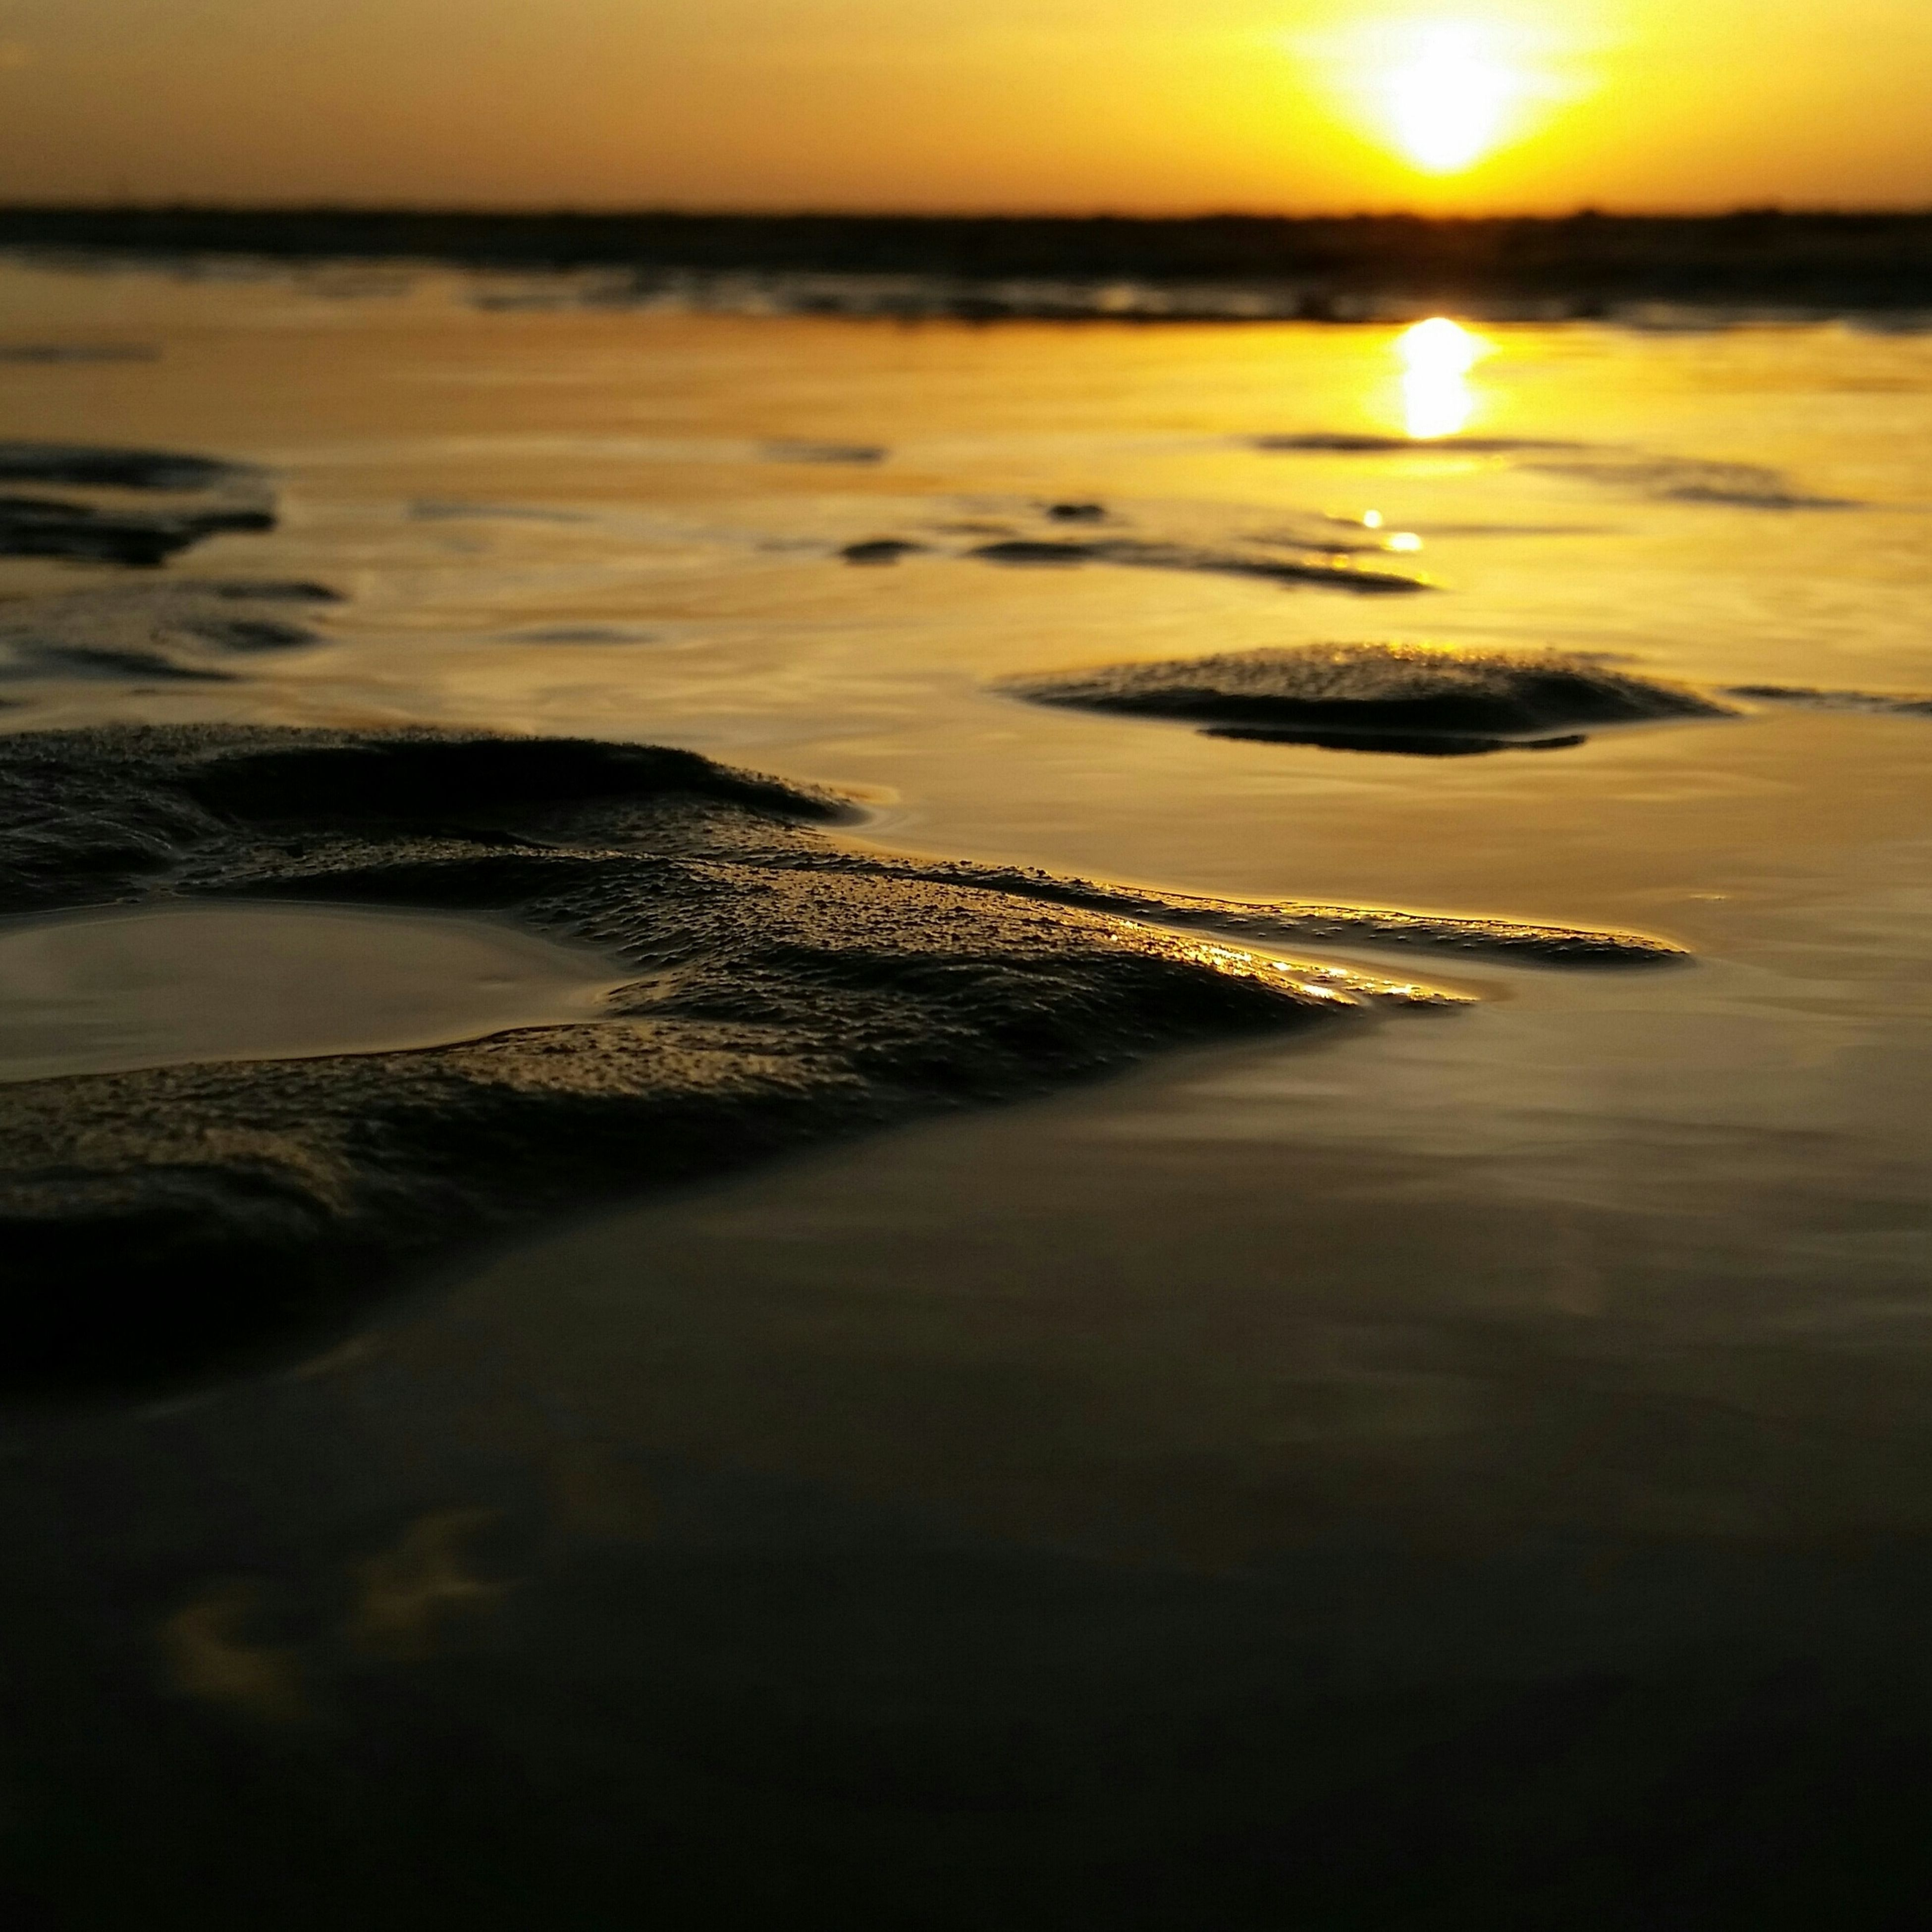 sea, water, sunset, horizon over water, scenics, tranquil scene, beach, tranquility, beauty in nature, shore, sun, idyllic, reflection, nature, sky, wave, orange color, coastline, seascape, sunlight